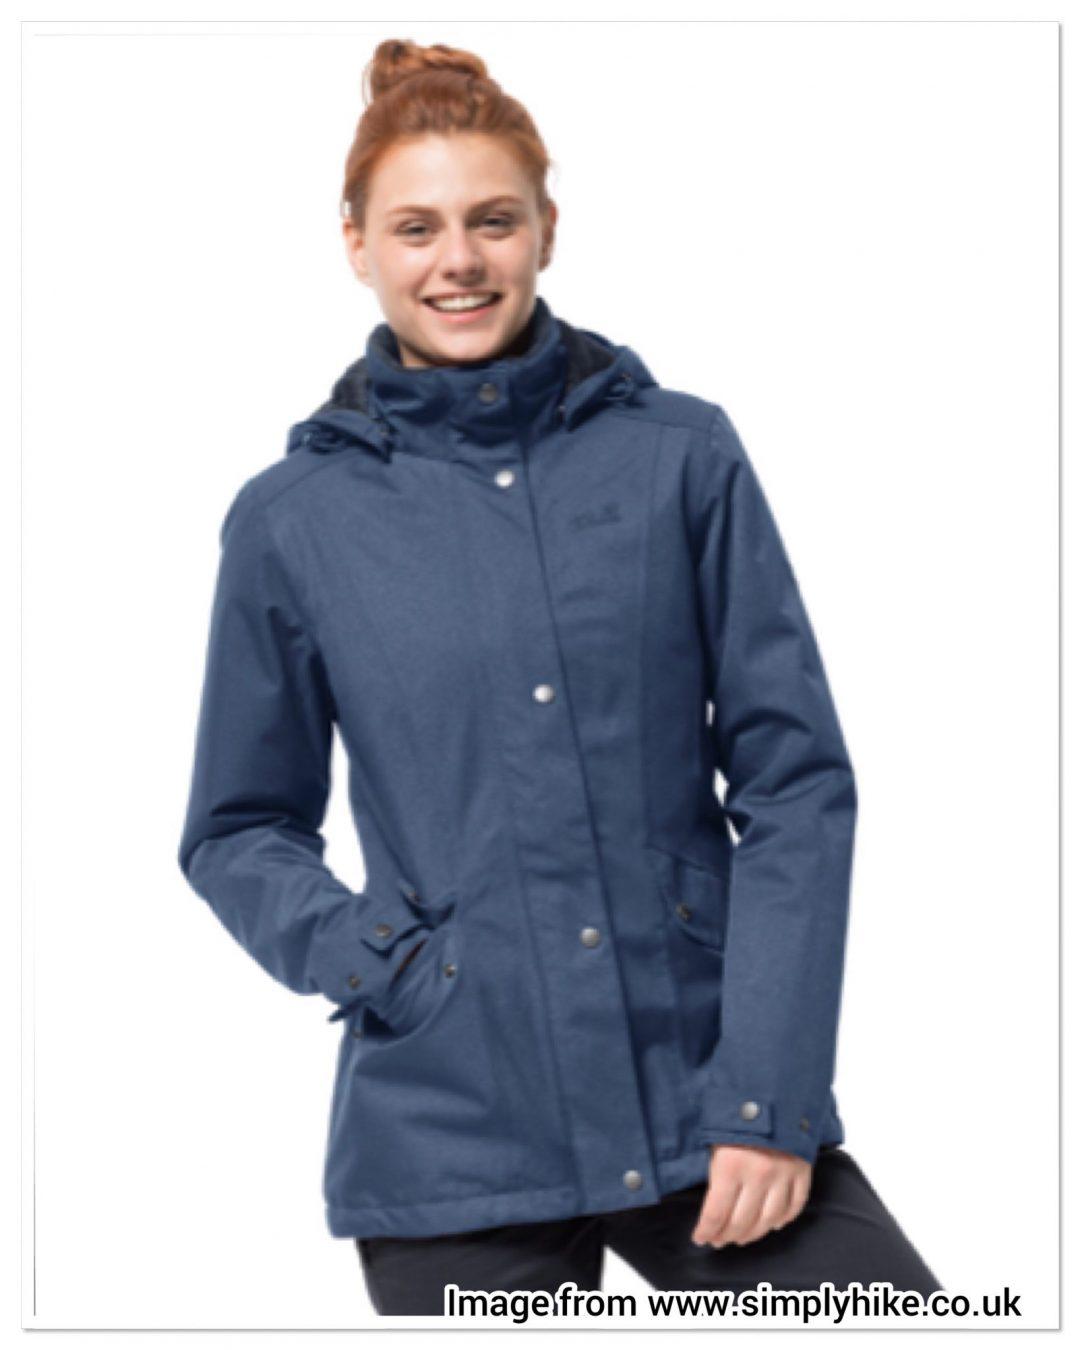 Simply Hike Jack Wolfskin collection jacket navy waterproof school run